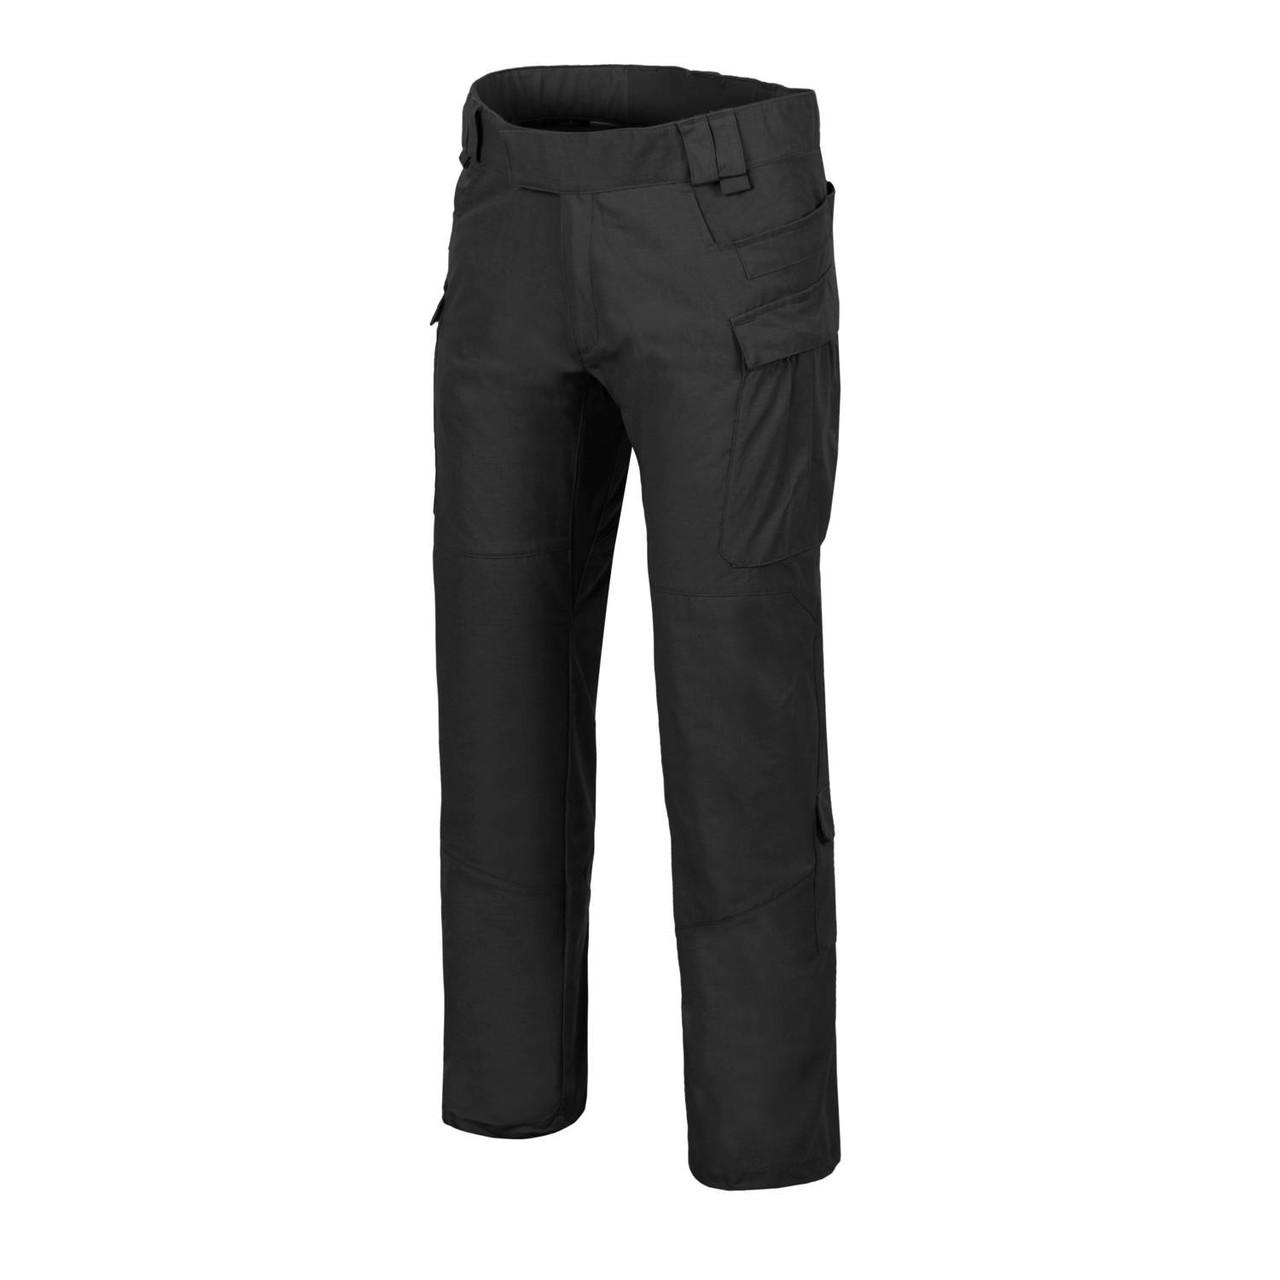 Штани Helikon-Tex® MBDU® Trousers - NyCo Ripstop - Black